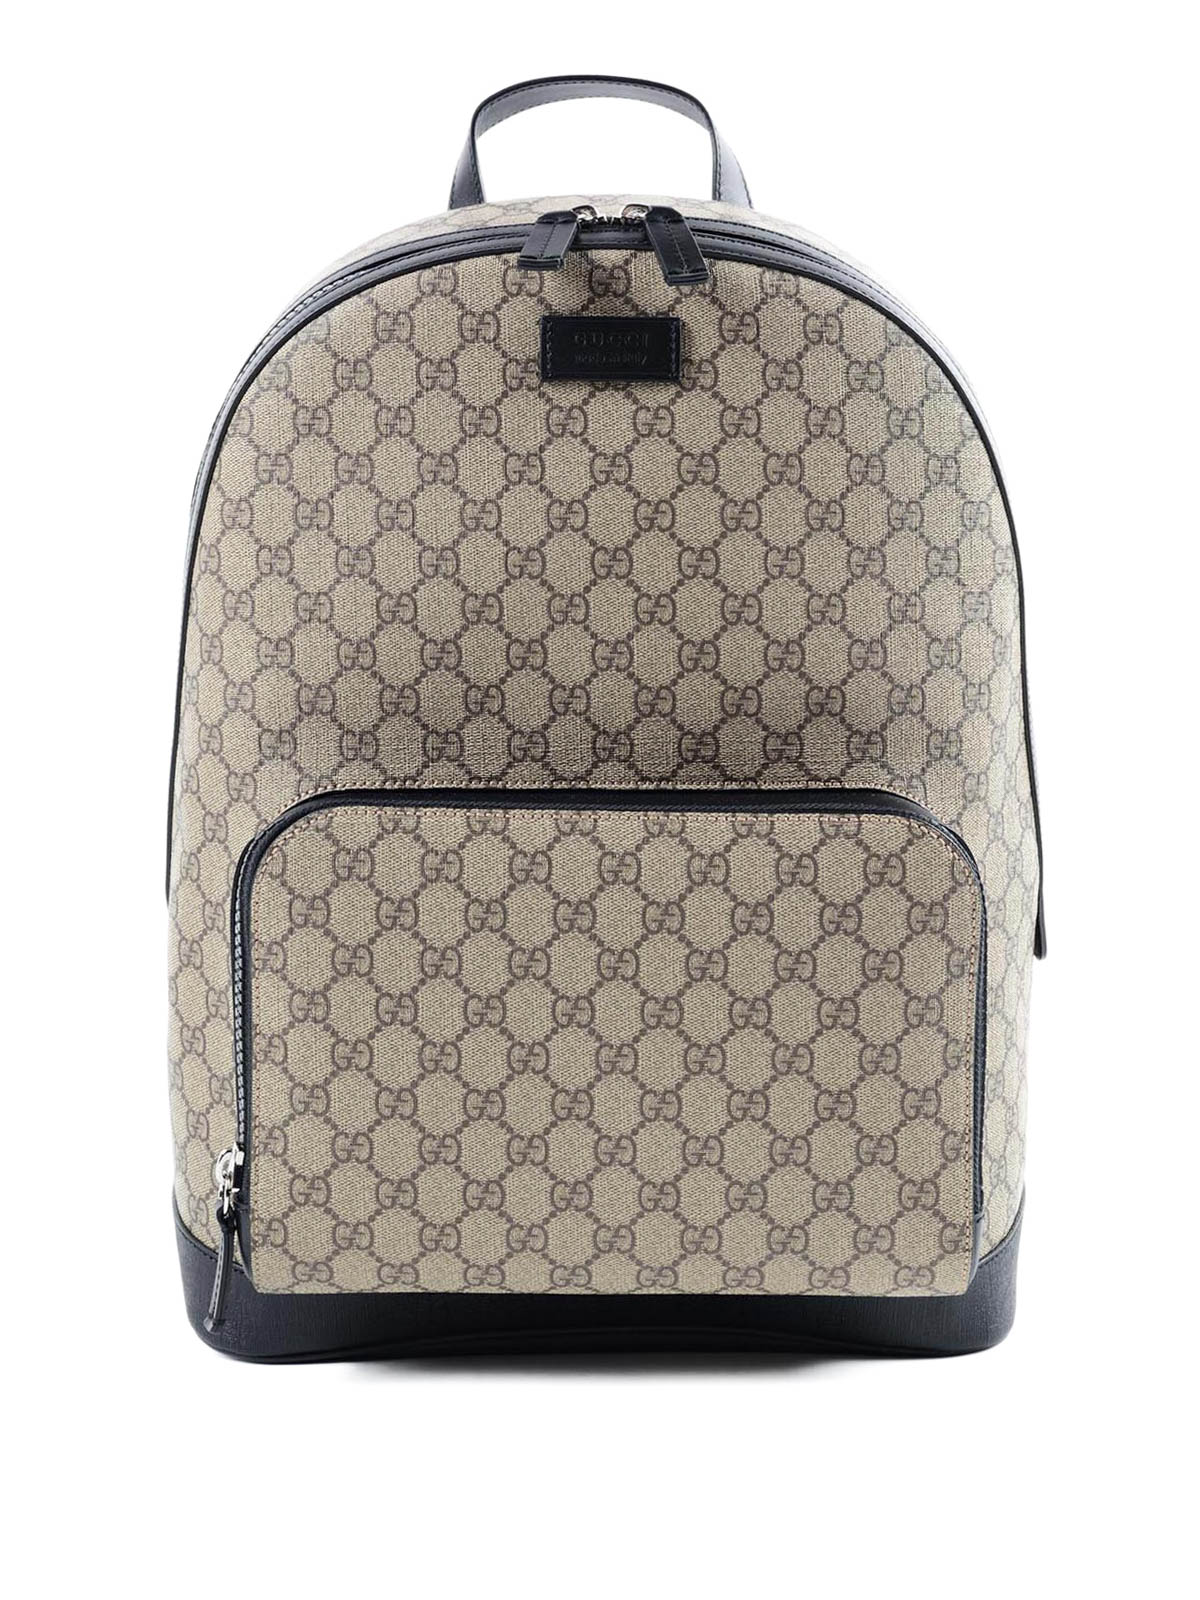 Gucci - Mochila Gg Supreme - Negro - Mochilas - 406370 KLQAX 9772 b36d1a04860